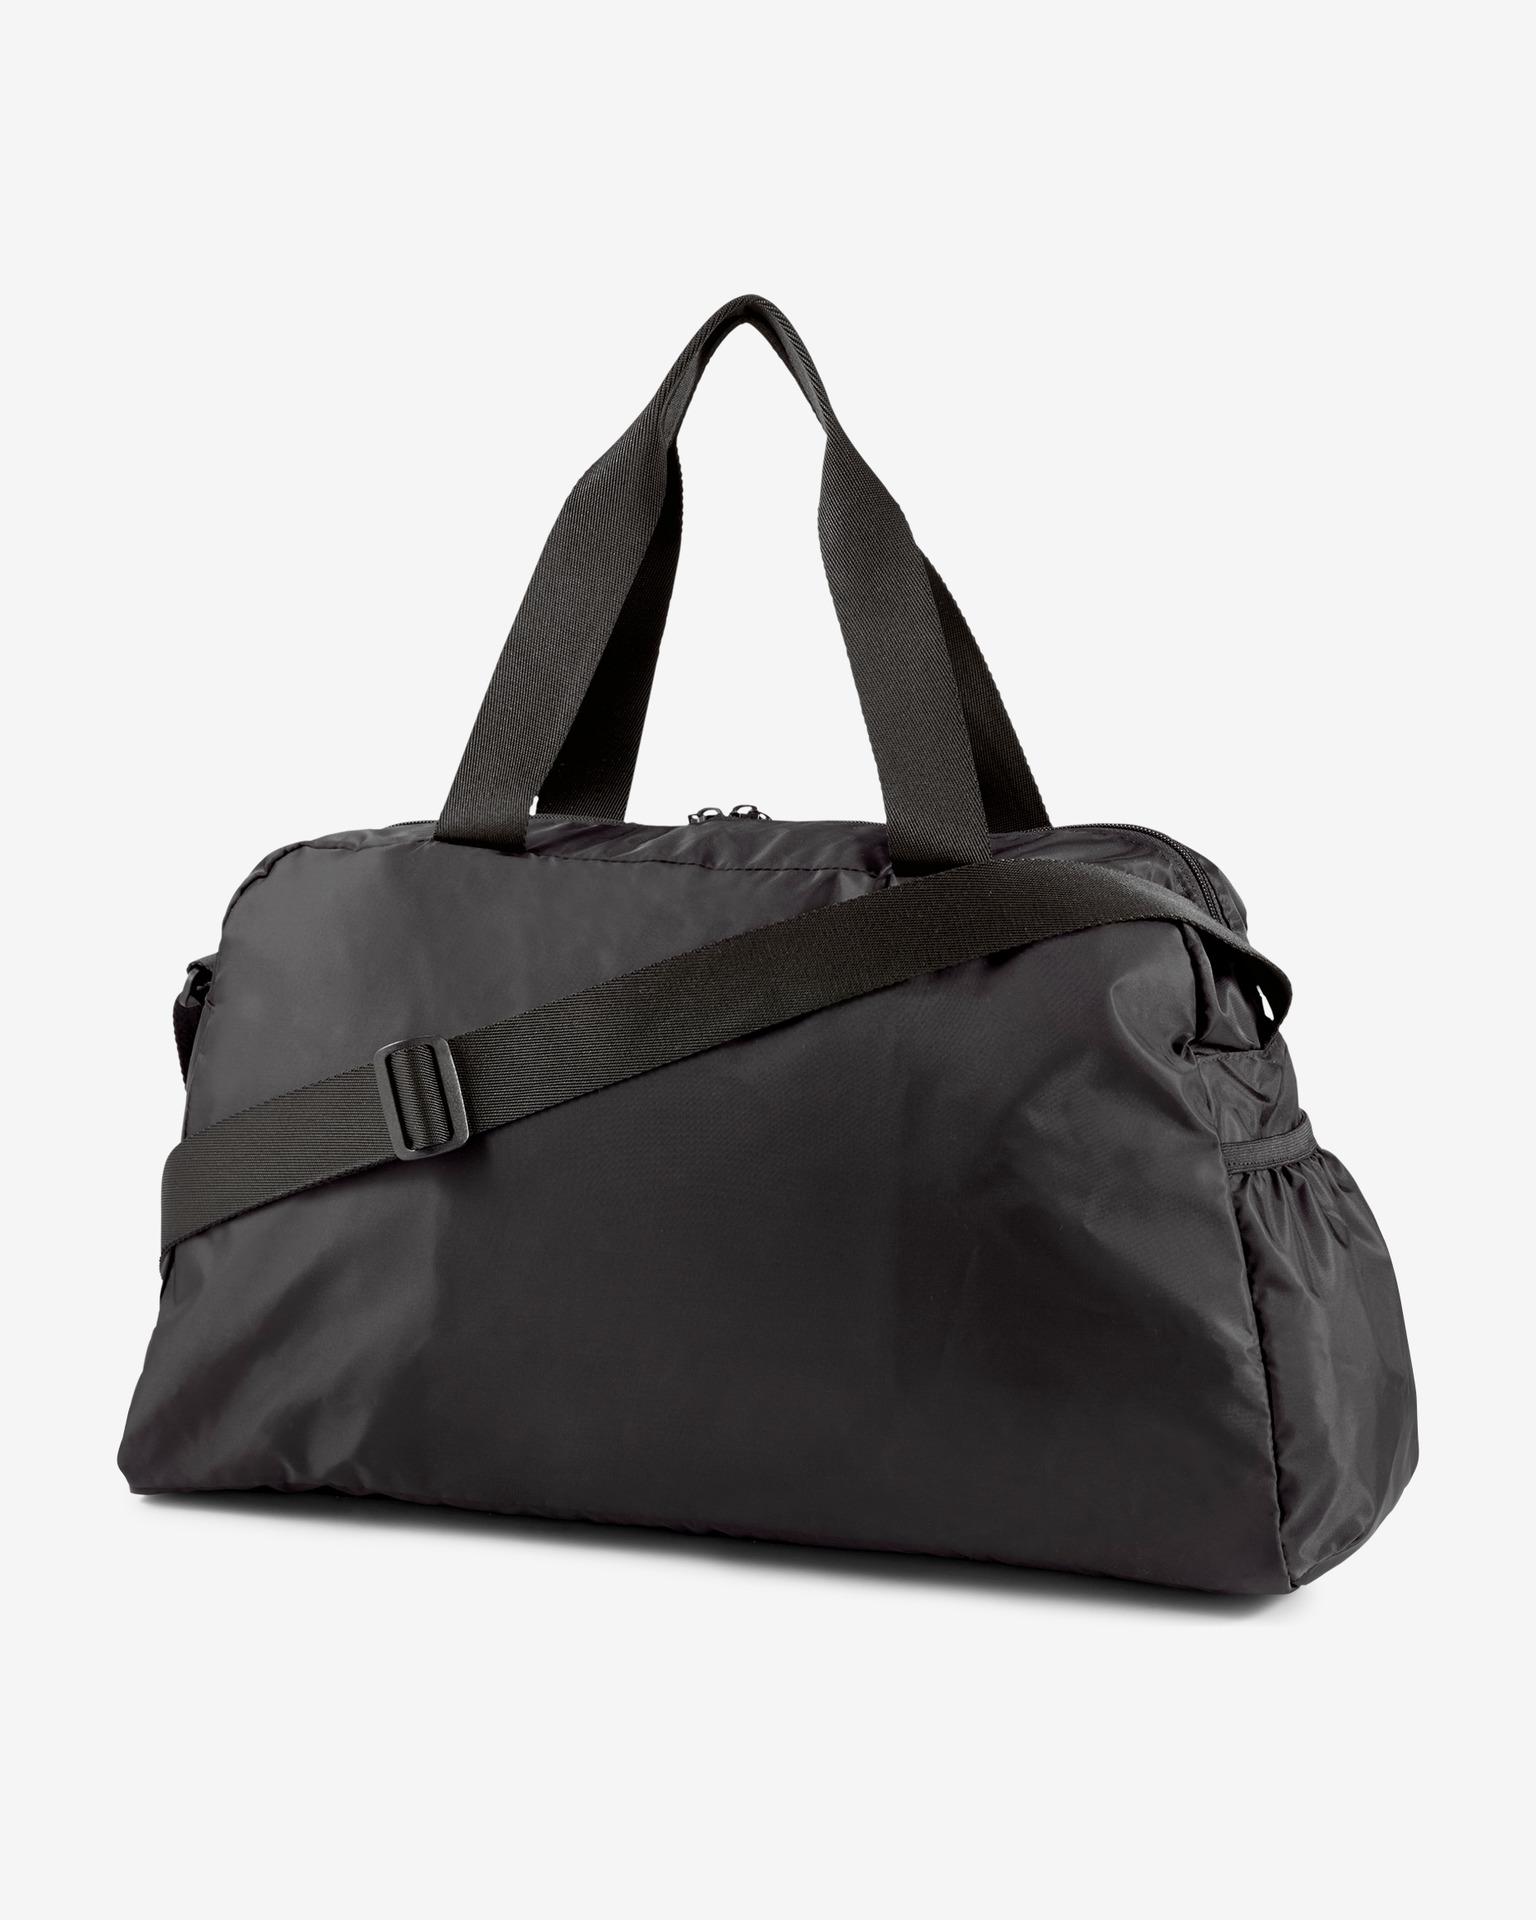 Puma black bag At Ess Grip